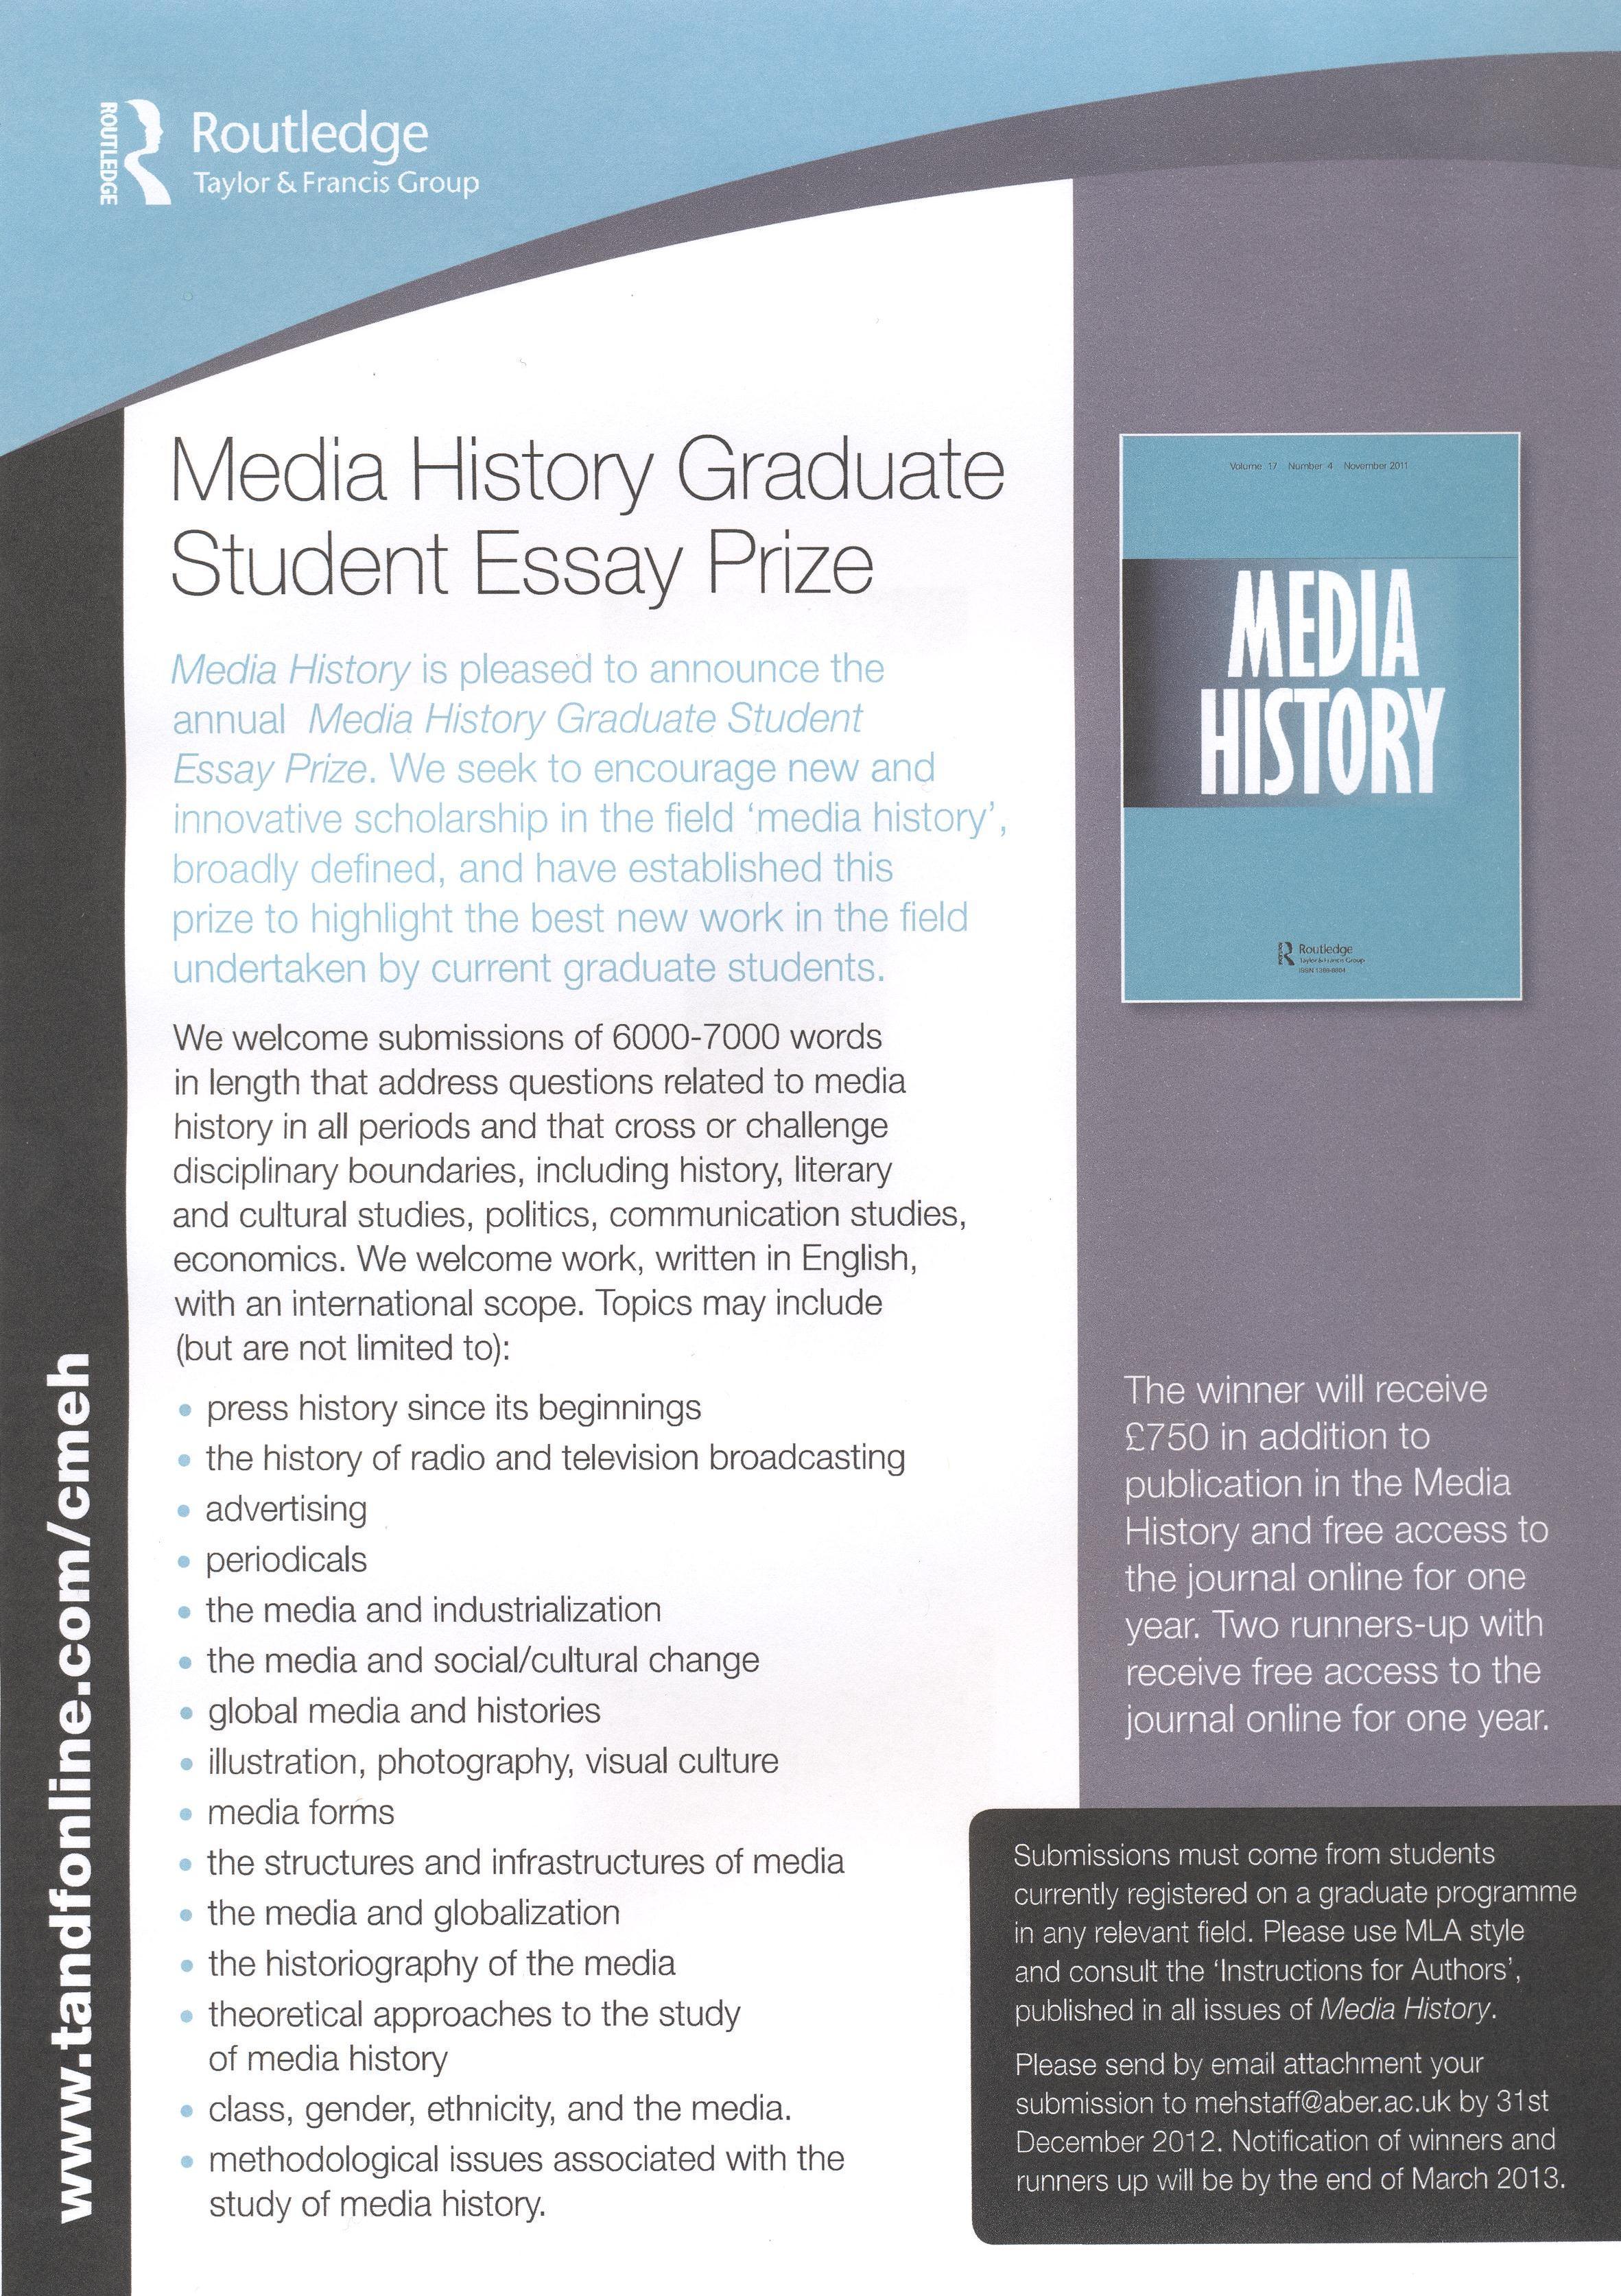 media history graduate student essay prize